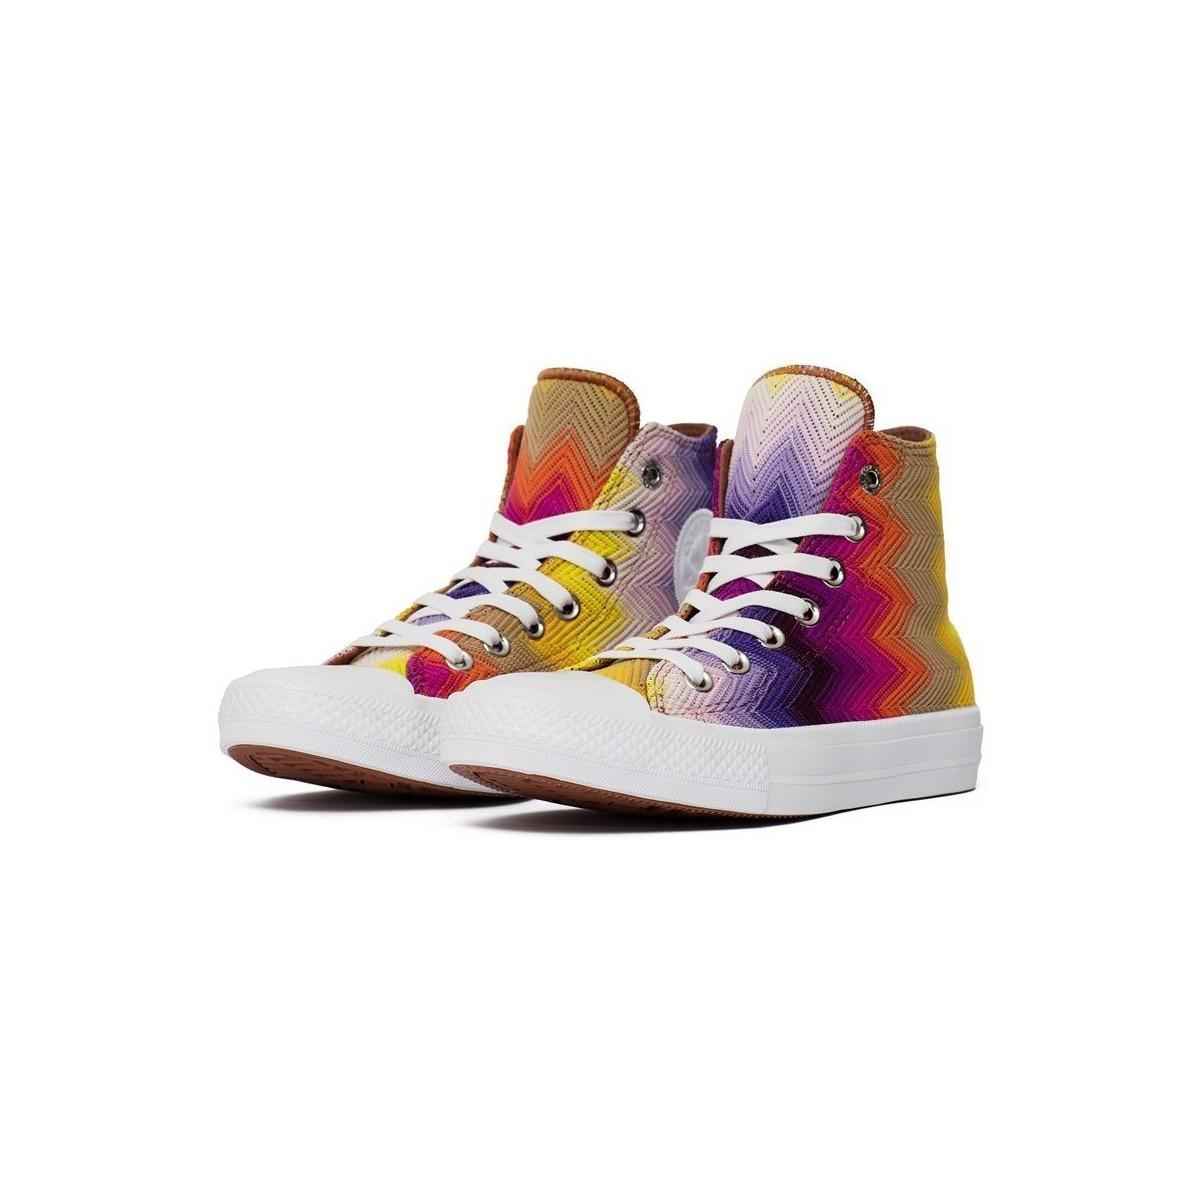 83fa82c997e6 Converse Chuck Taylor All Star Ii X Missoni Men s Shoes (high-top ...